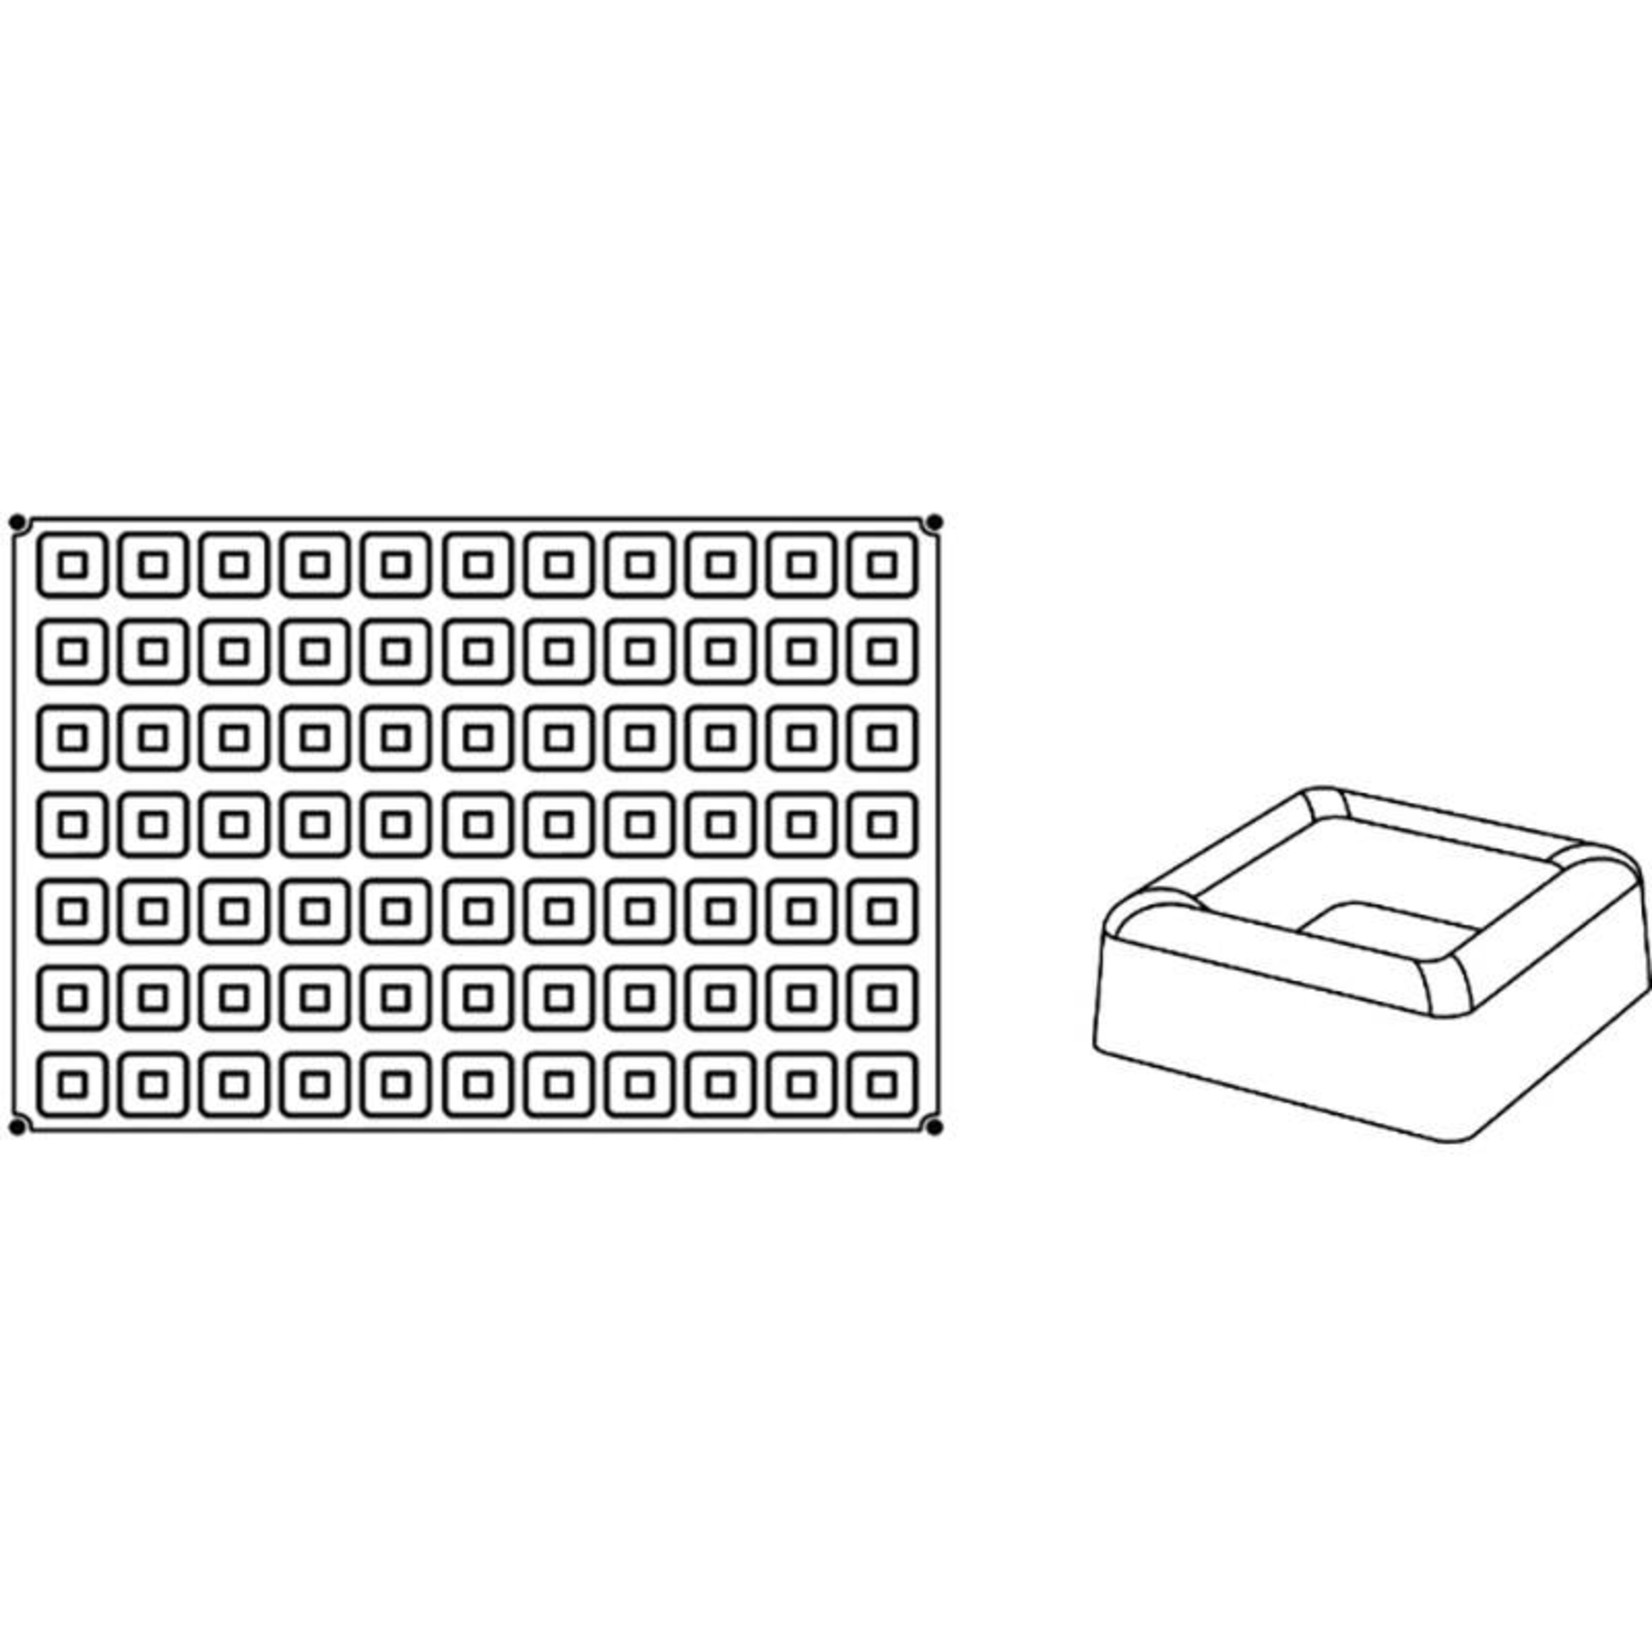 Pavoni Pavoni - Pavoflex silicone mold, Savarin square, Mignon (77 cavity), PX046